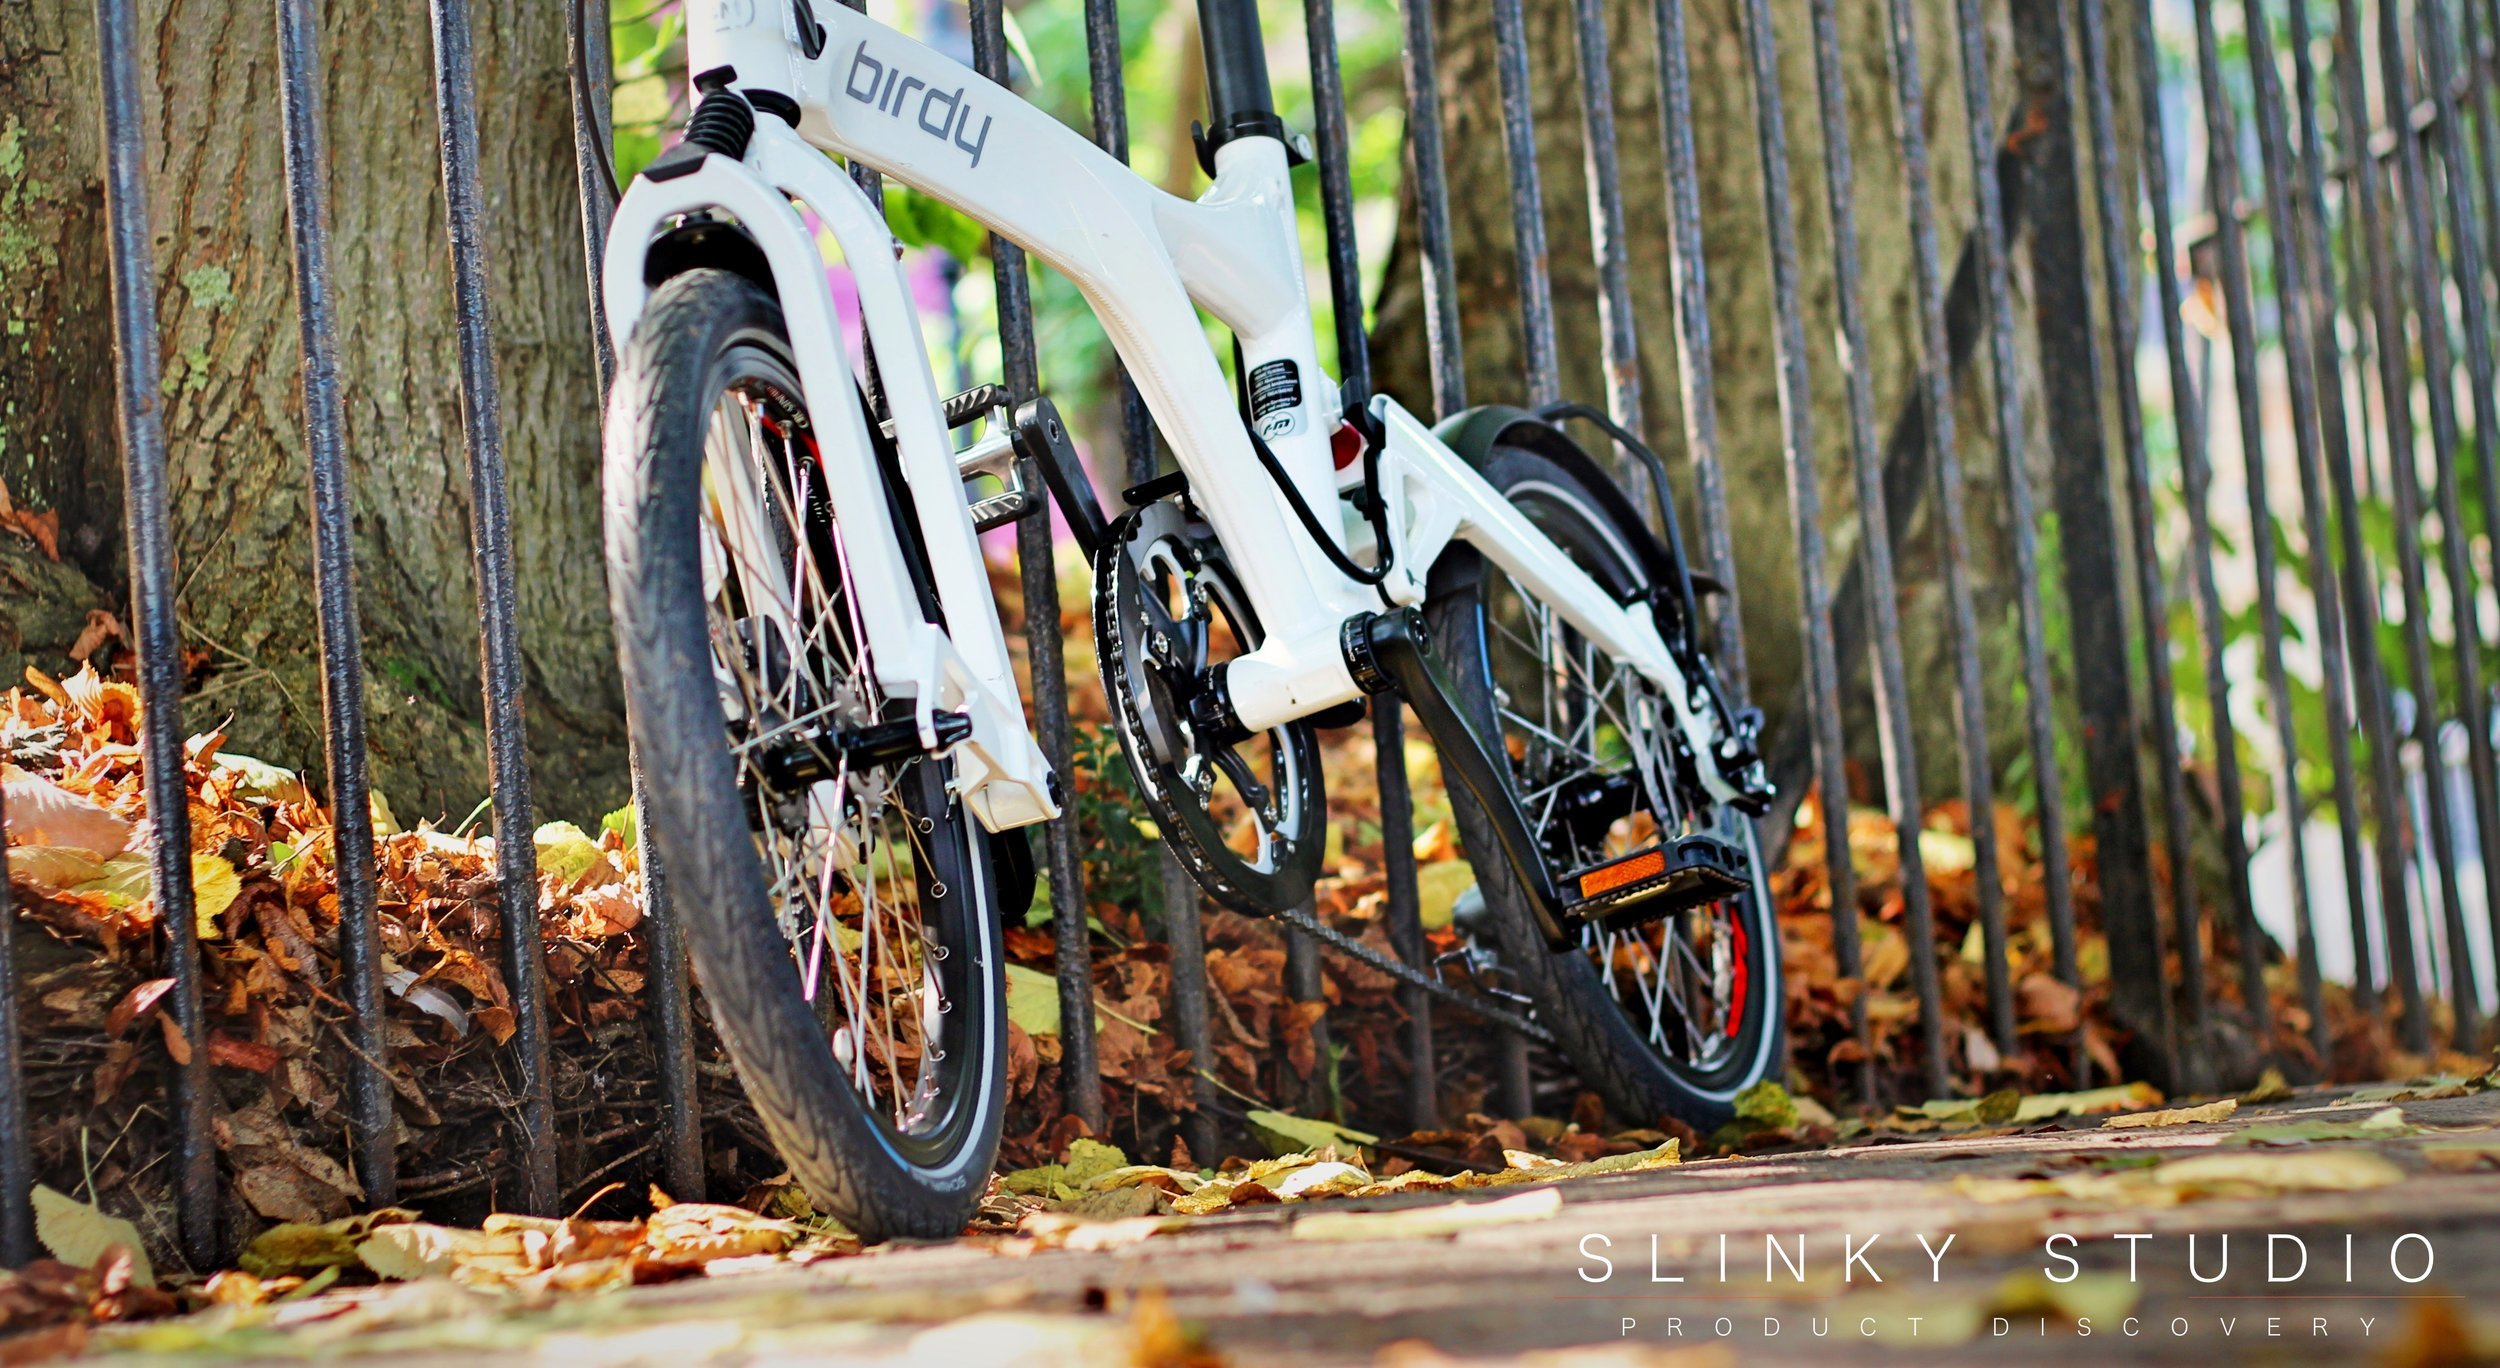 Birdy Speed Folding Bike White Leafy Autumn Path Ground View.jpg